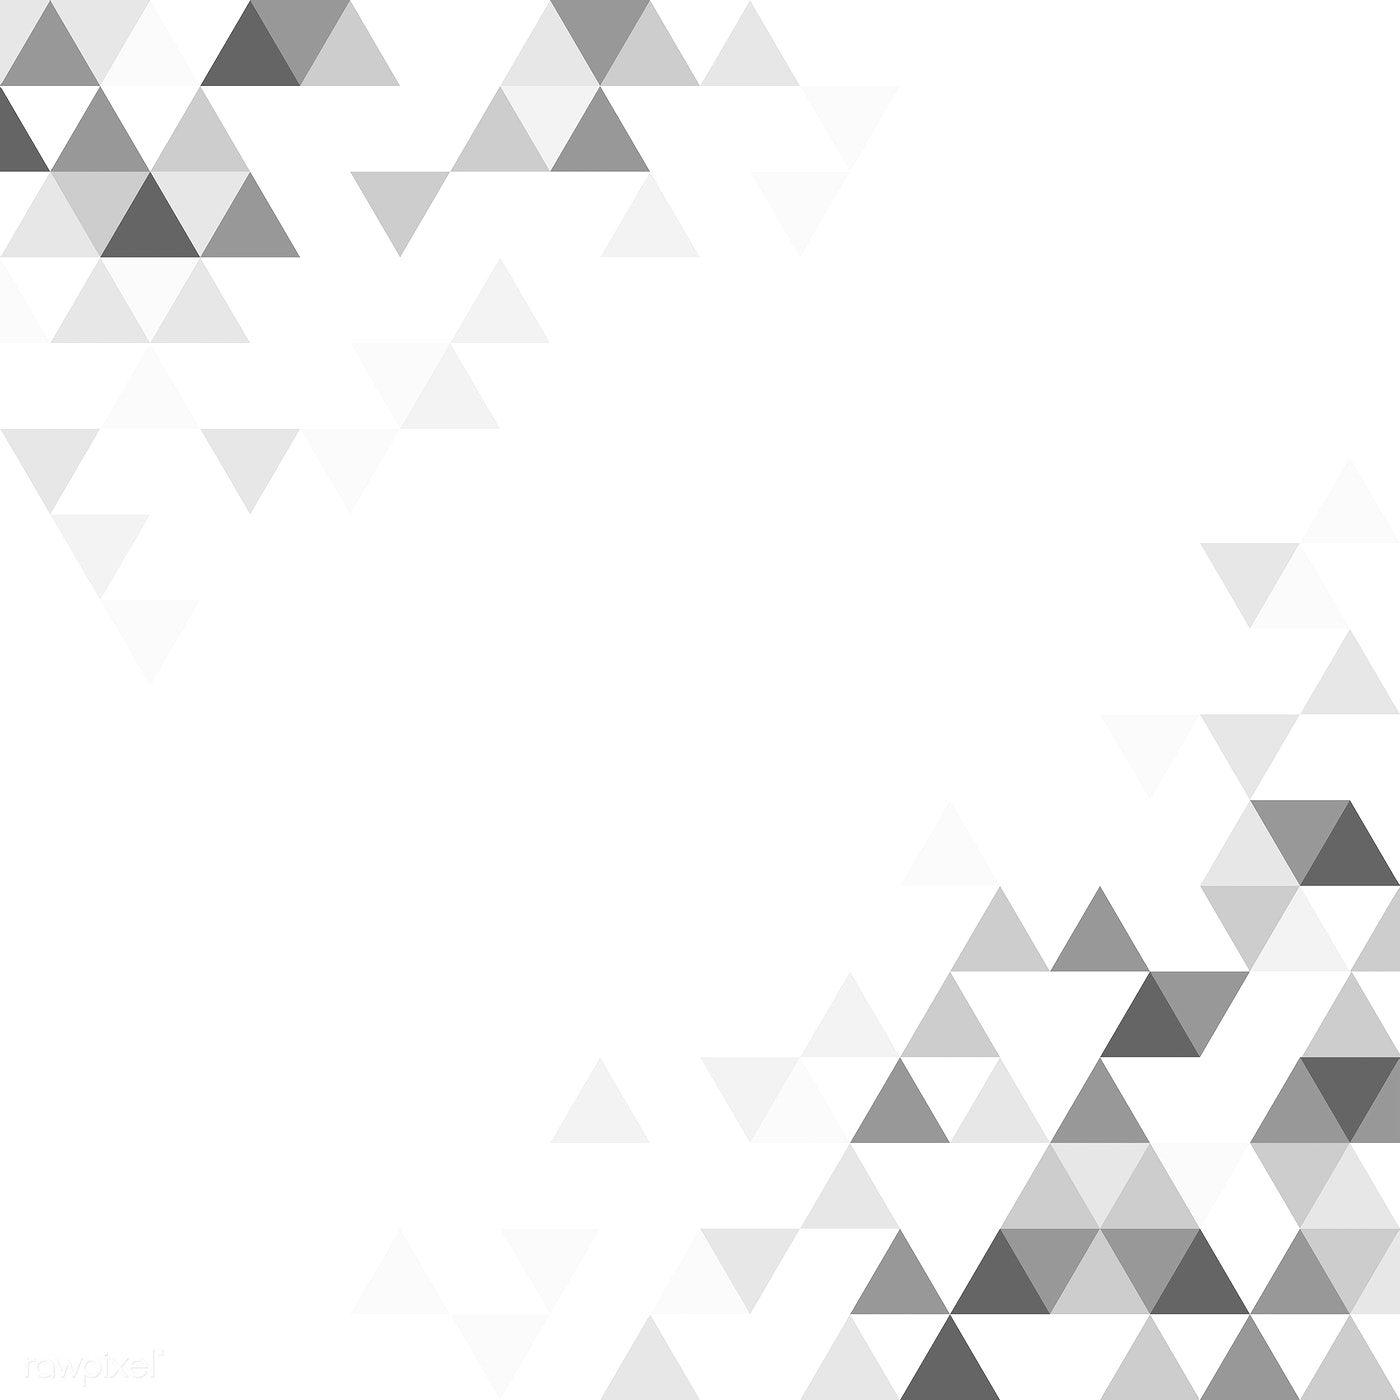 Gray Triangle Patterned On White Background Free Image By Rawpixel Com Triangle Pattern Pattern Illustration Geometric Background